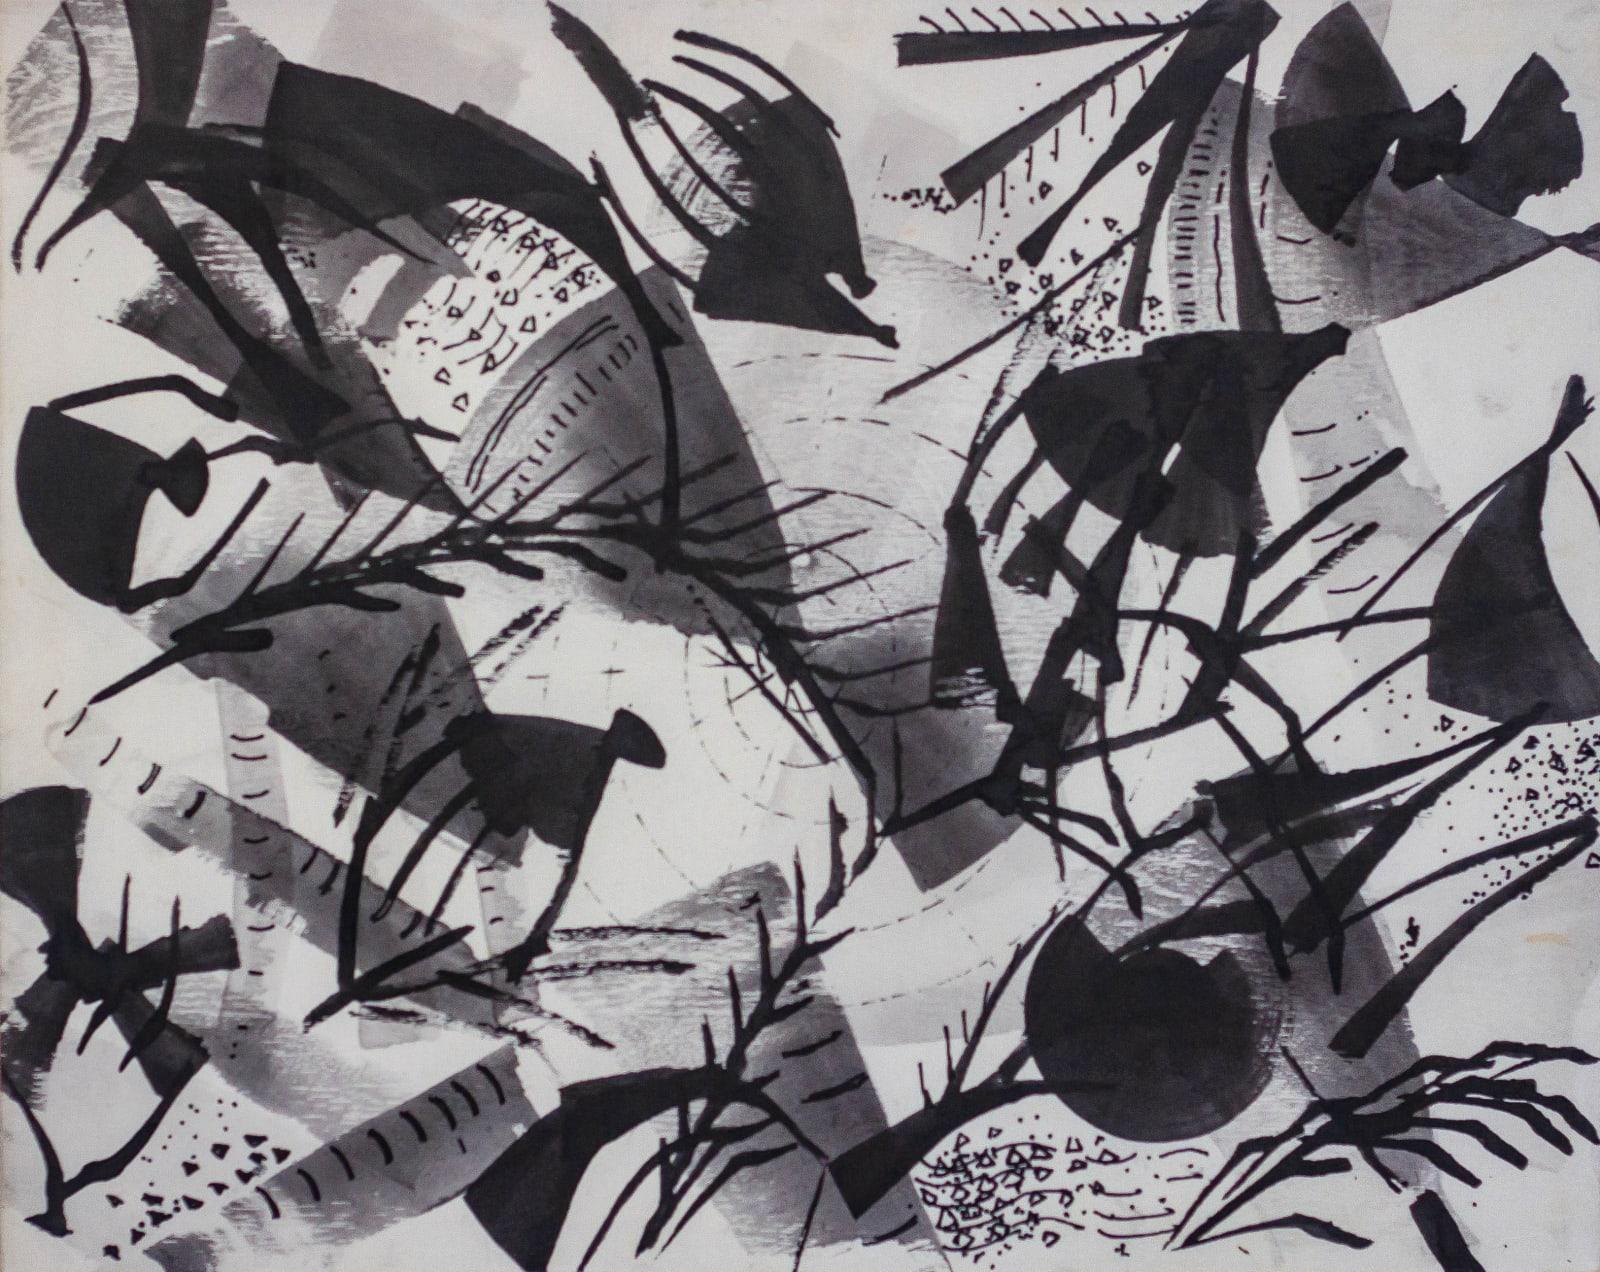 Patrick Tagoe Turkson Menkronso Kwesida (Psalm Sunday) 67 x 84 cm Print